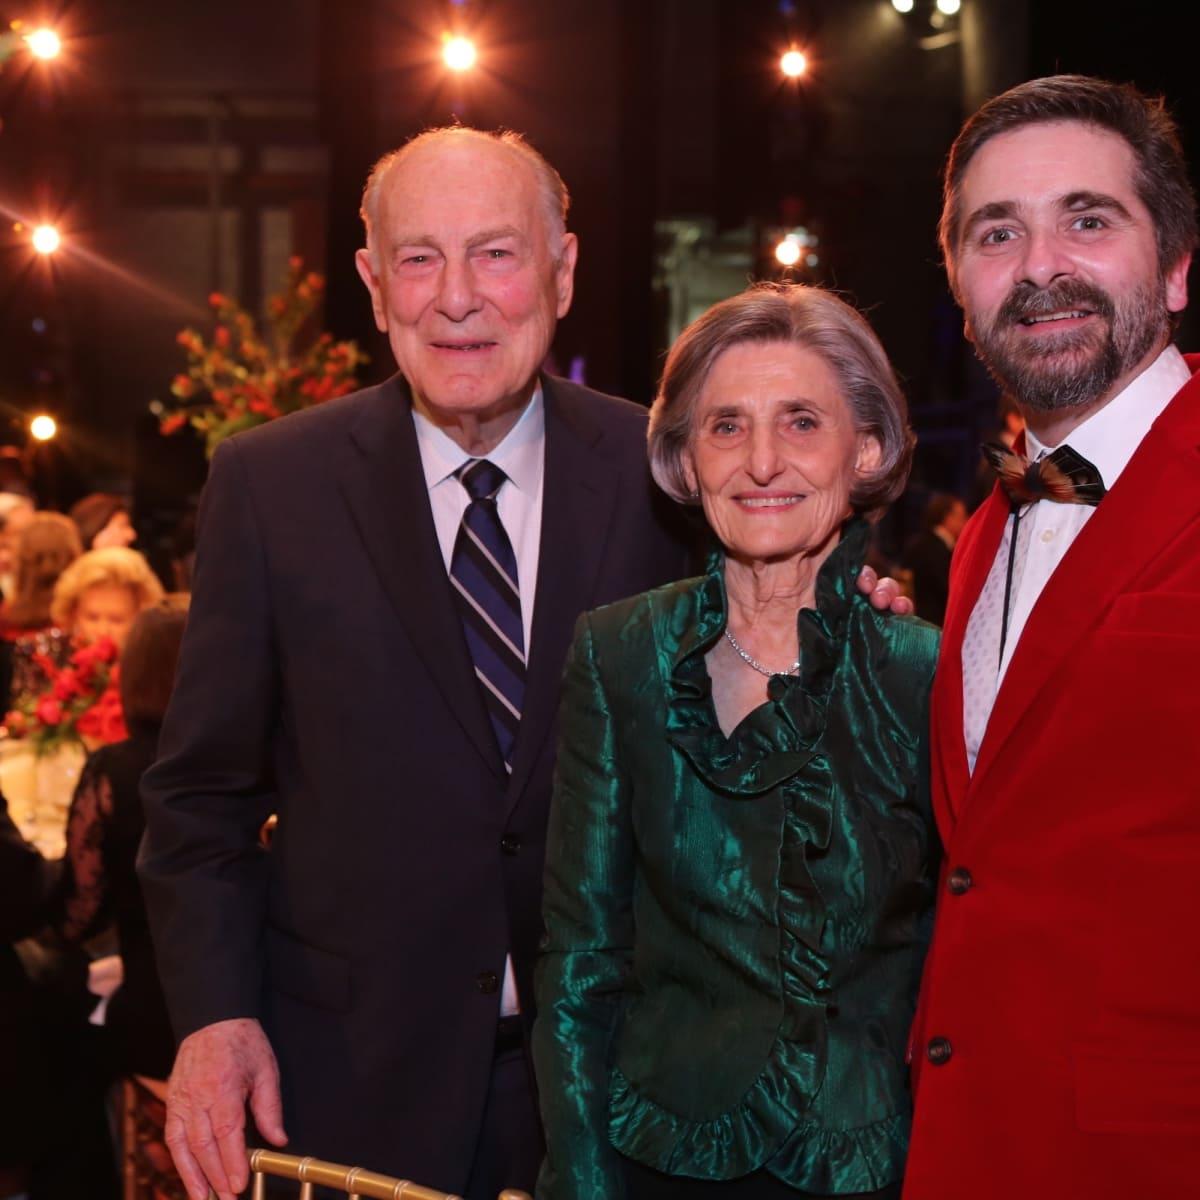 News, Houston Ballet Jubilee of Dance, Dec. 2015, Ted Barr, Melza Barr, Stanton Welch